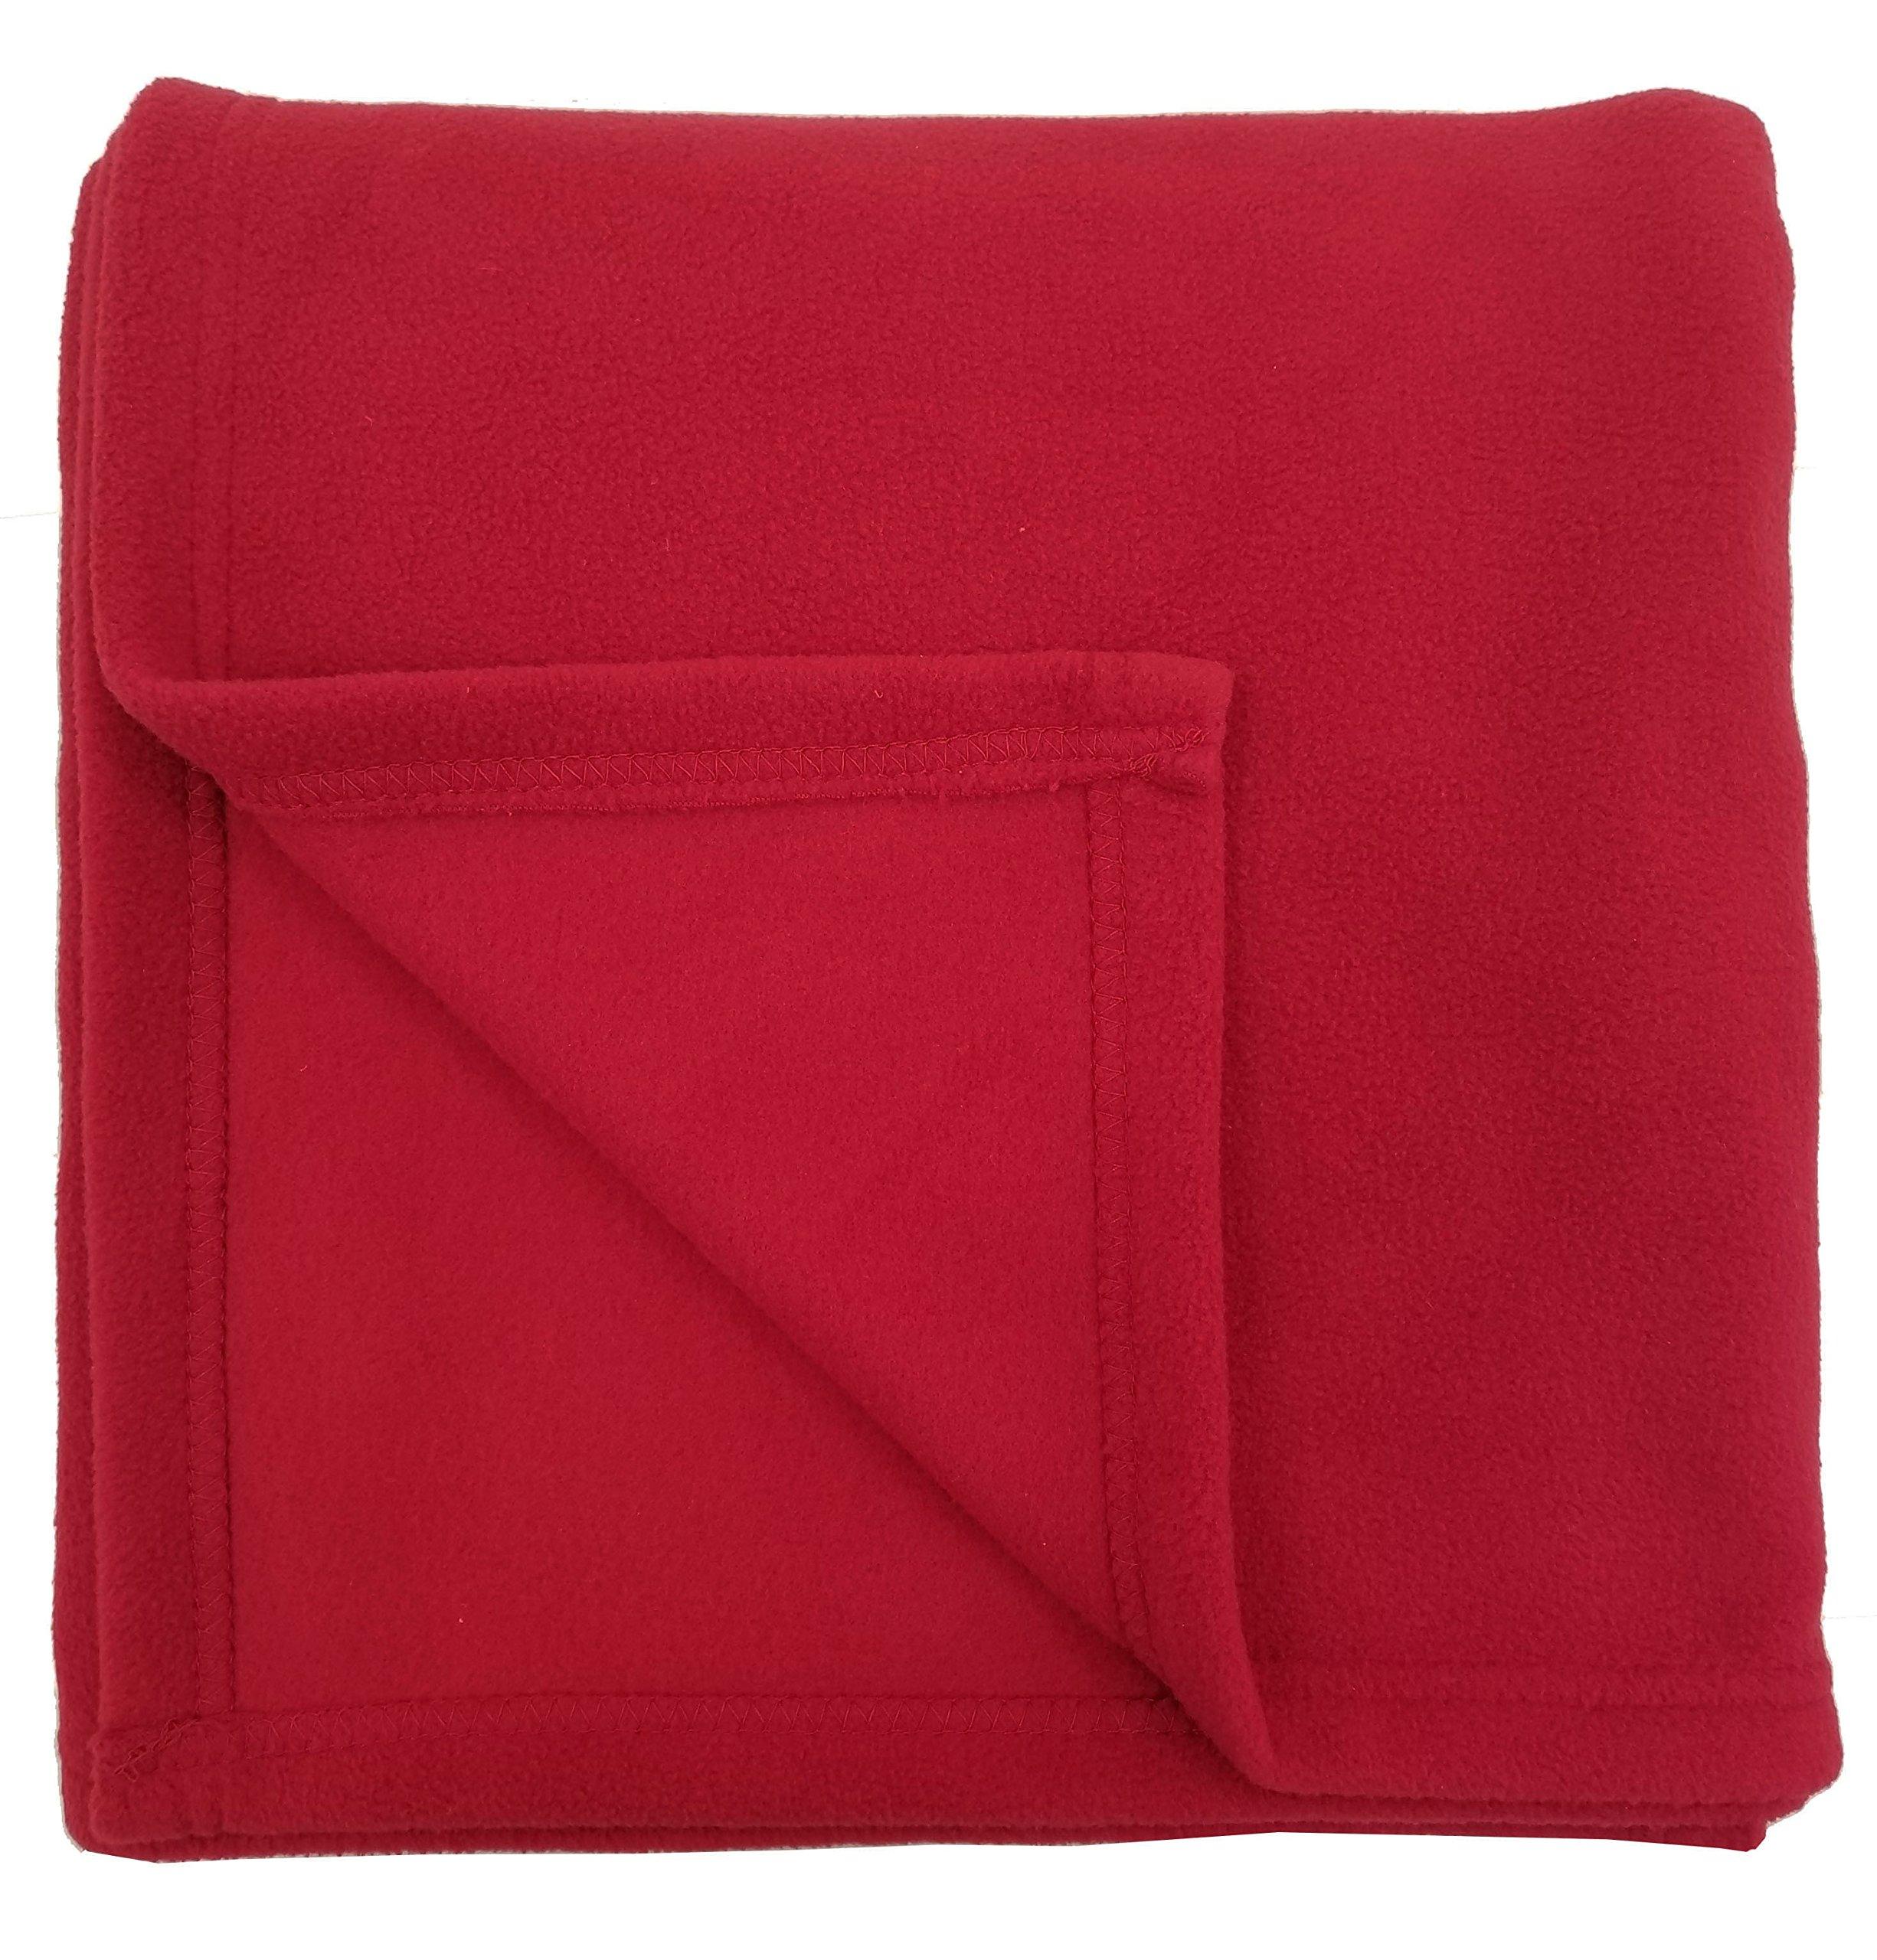 Rollee Pollee Children's Nap Blanket, Super Soft Anti-Pill Fleece Blanket Toddlers Kids, 36'' x 48'' (Red)